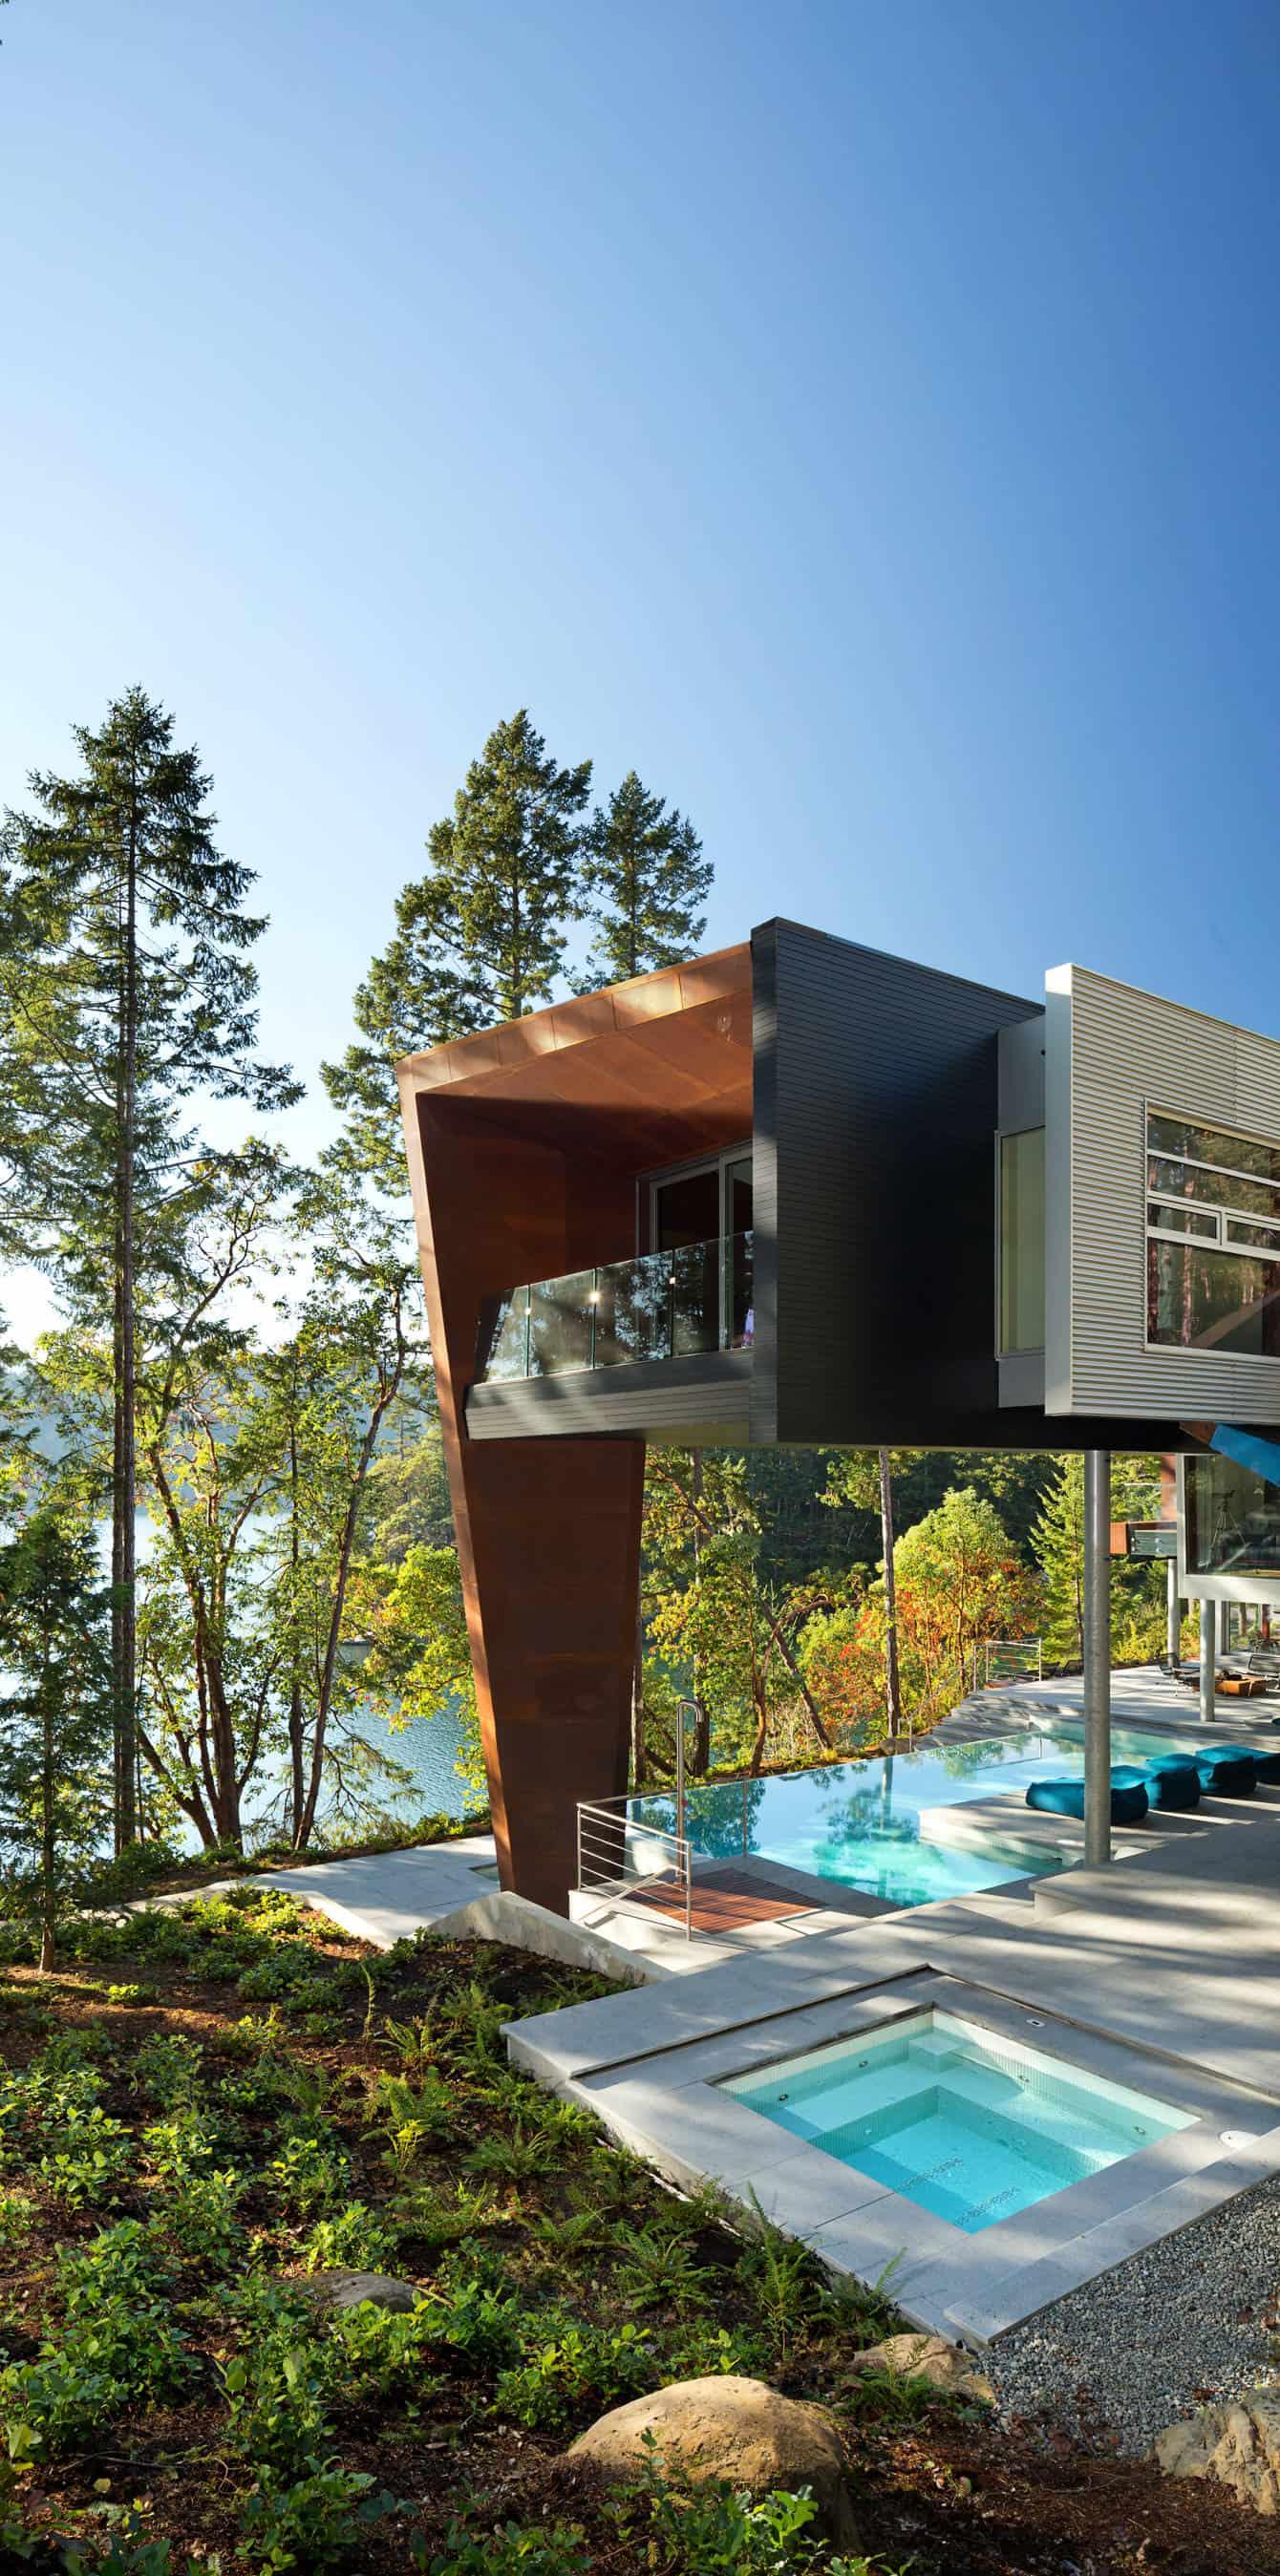 Gulf Islands Residence-AA Robins Architect-01-1 Kindesign